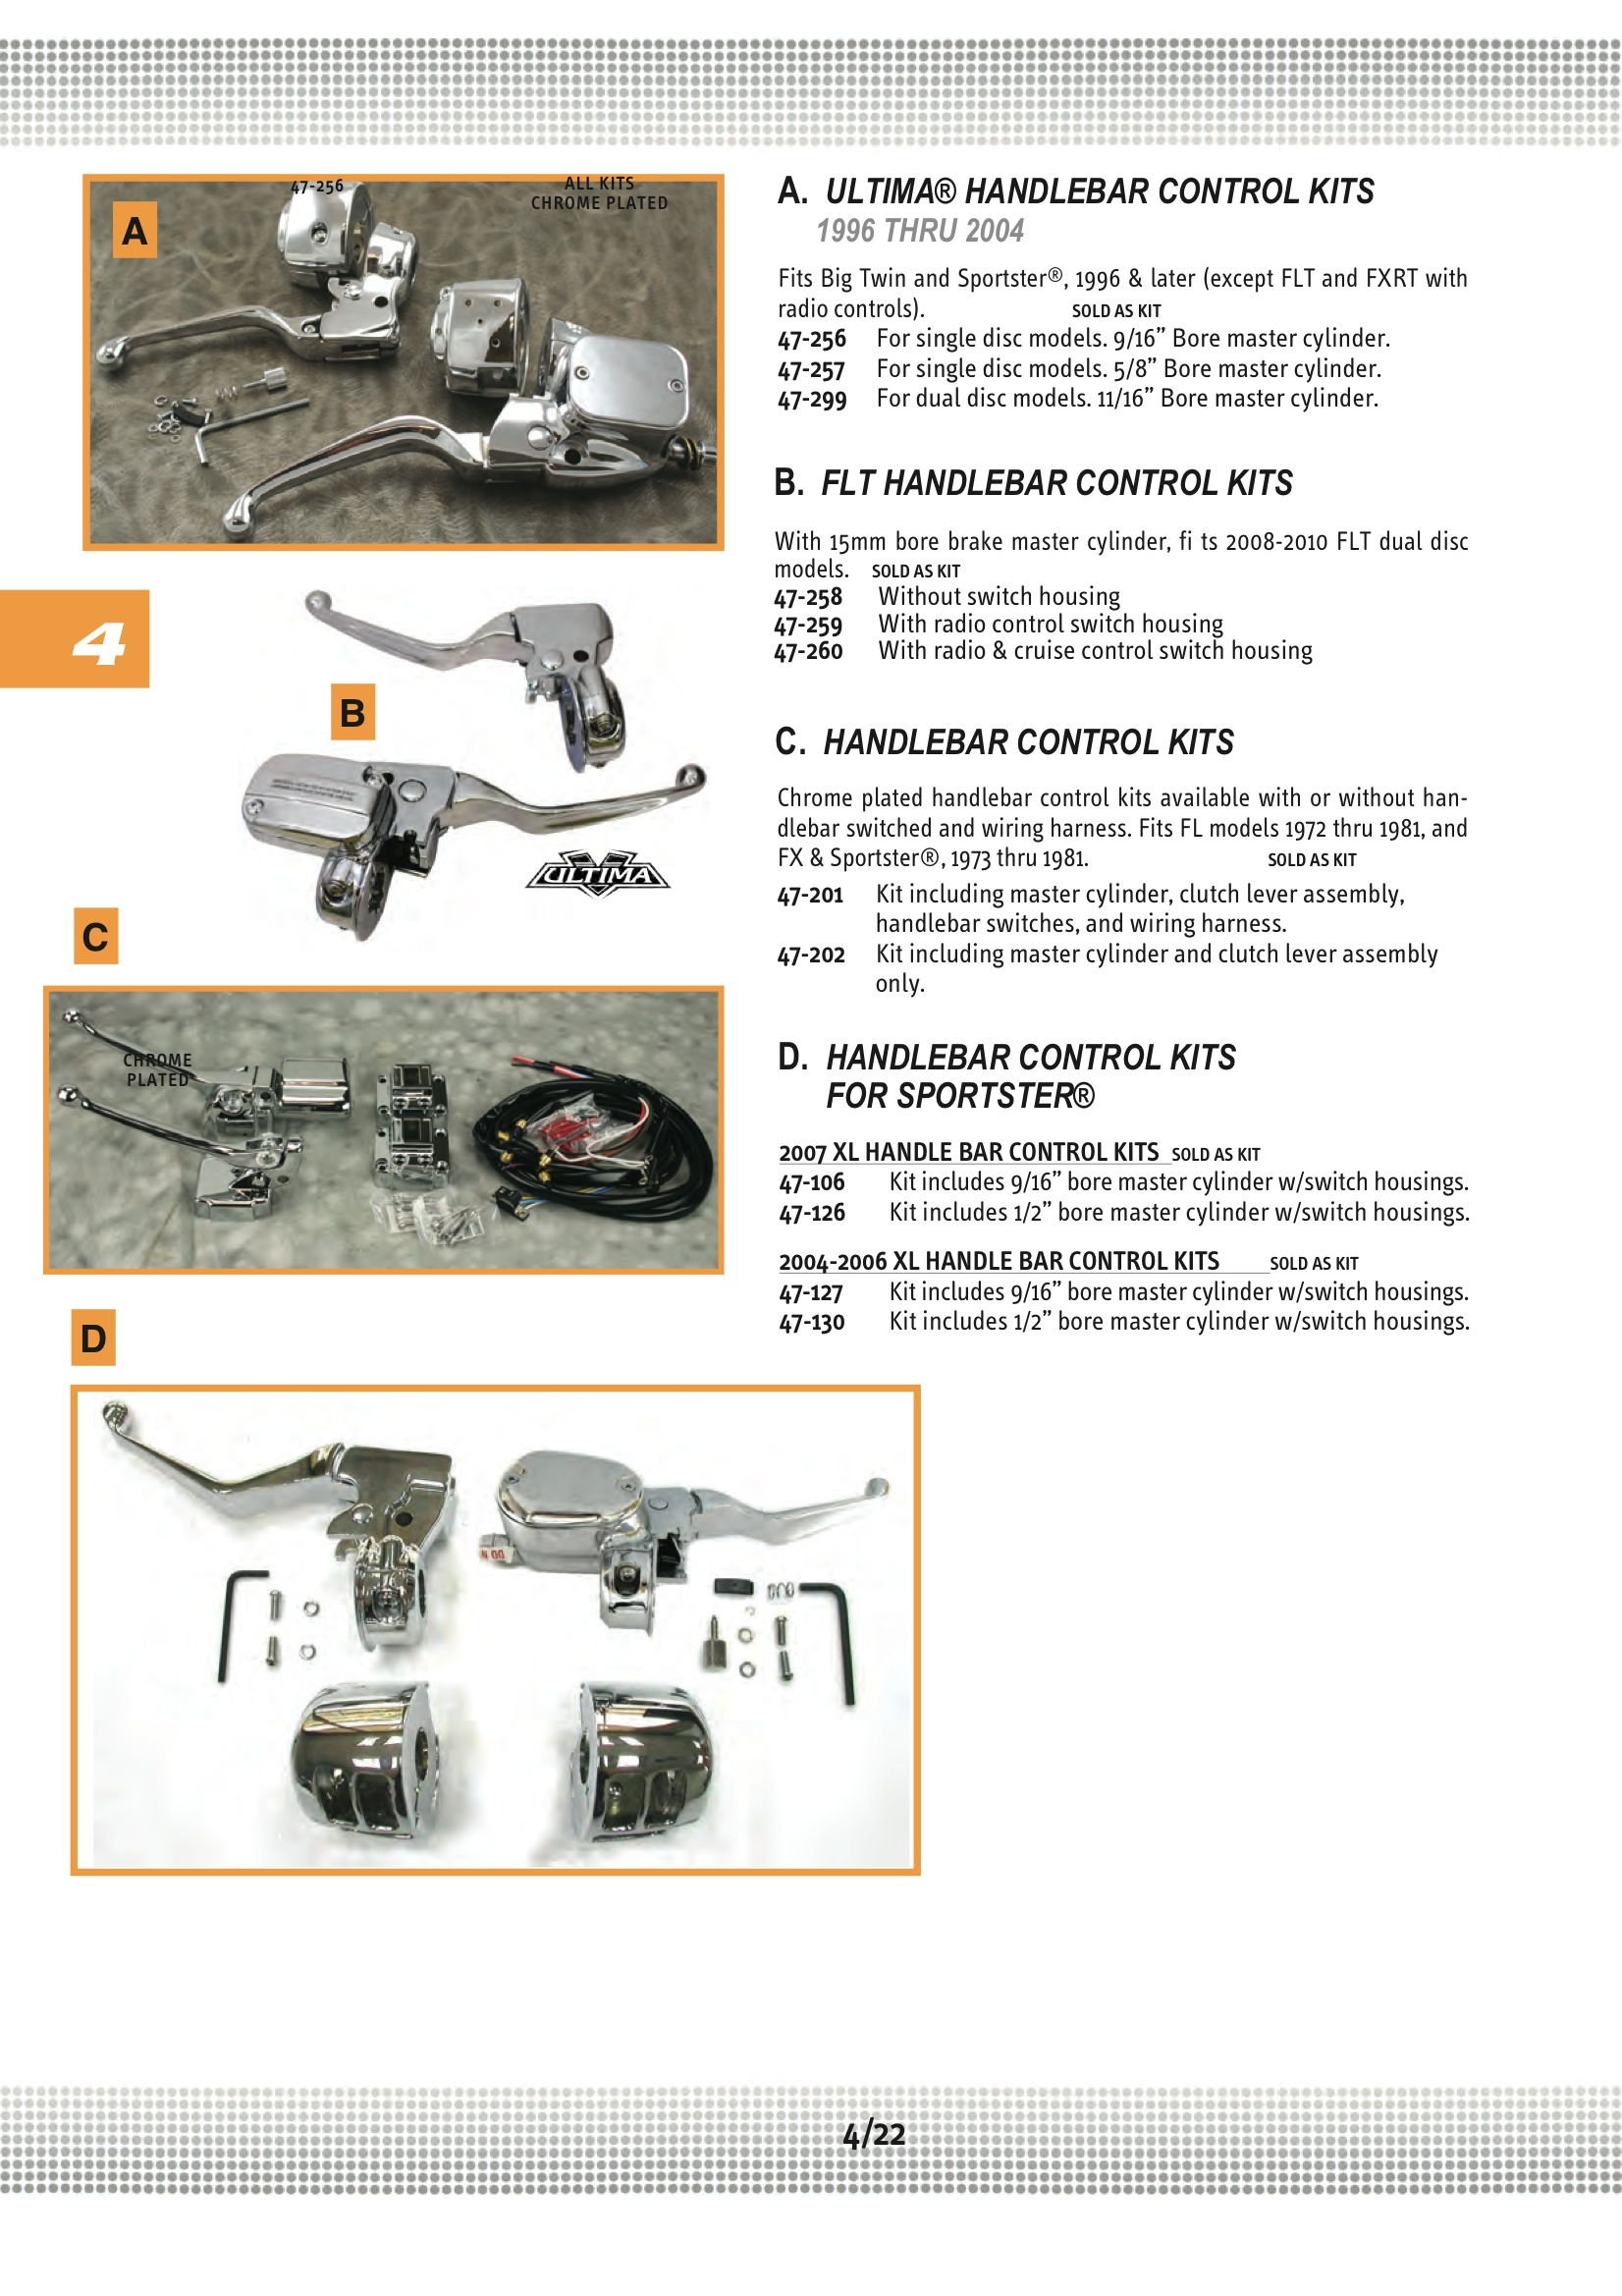 johnson ultima bilge pump wiring diagram wiring diagram and hernes, wire diagram, johnson ultima bilge pump wiring diagram